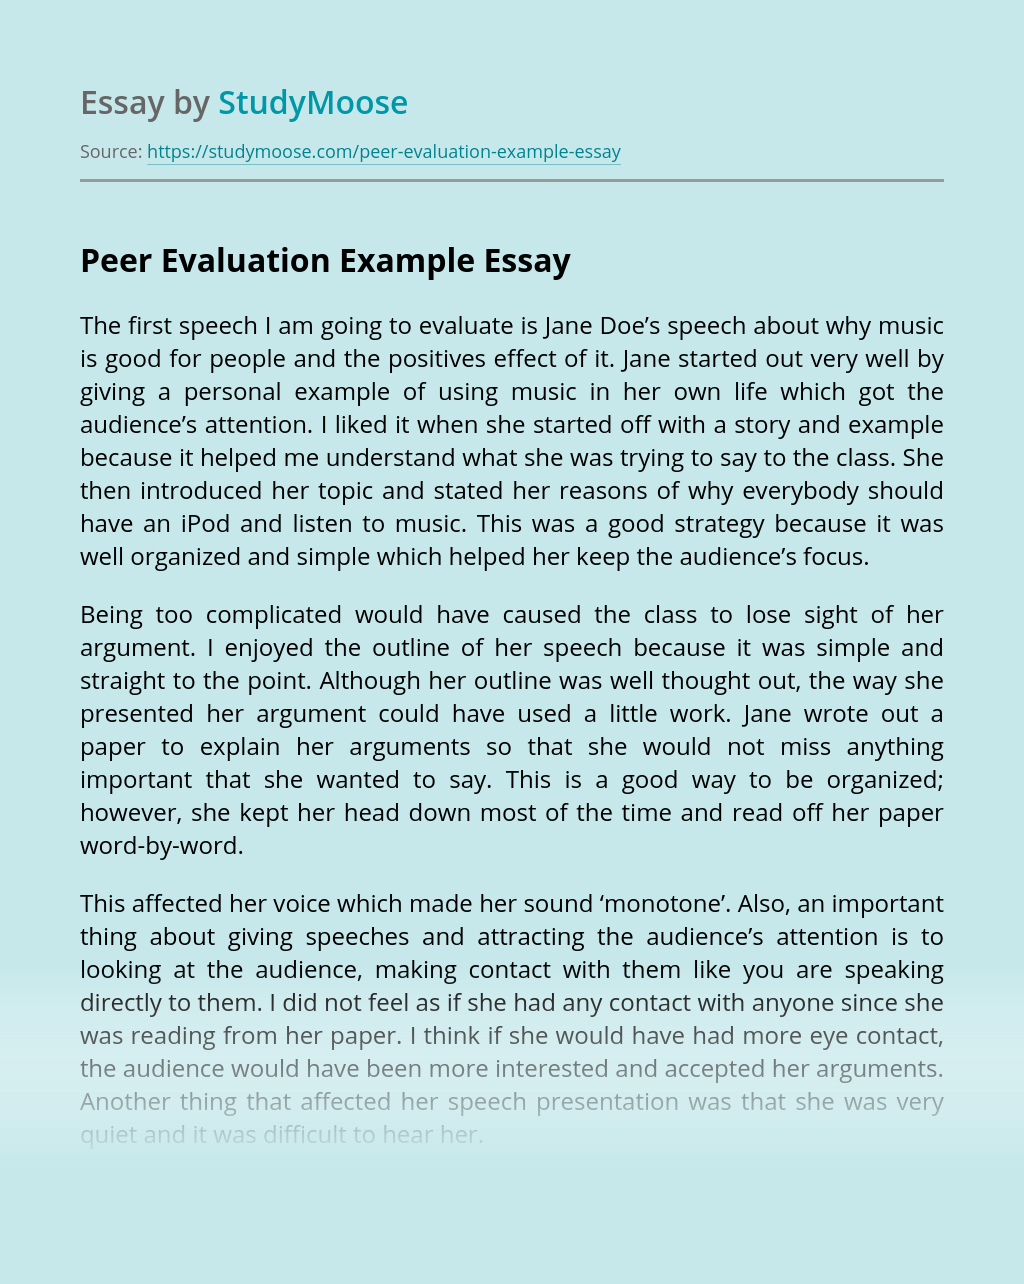 Peer Evaluation Example